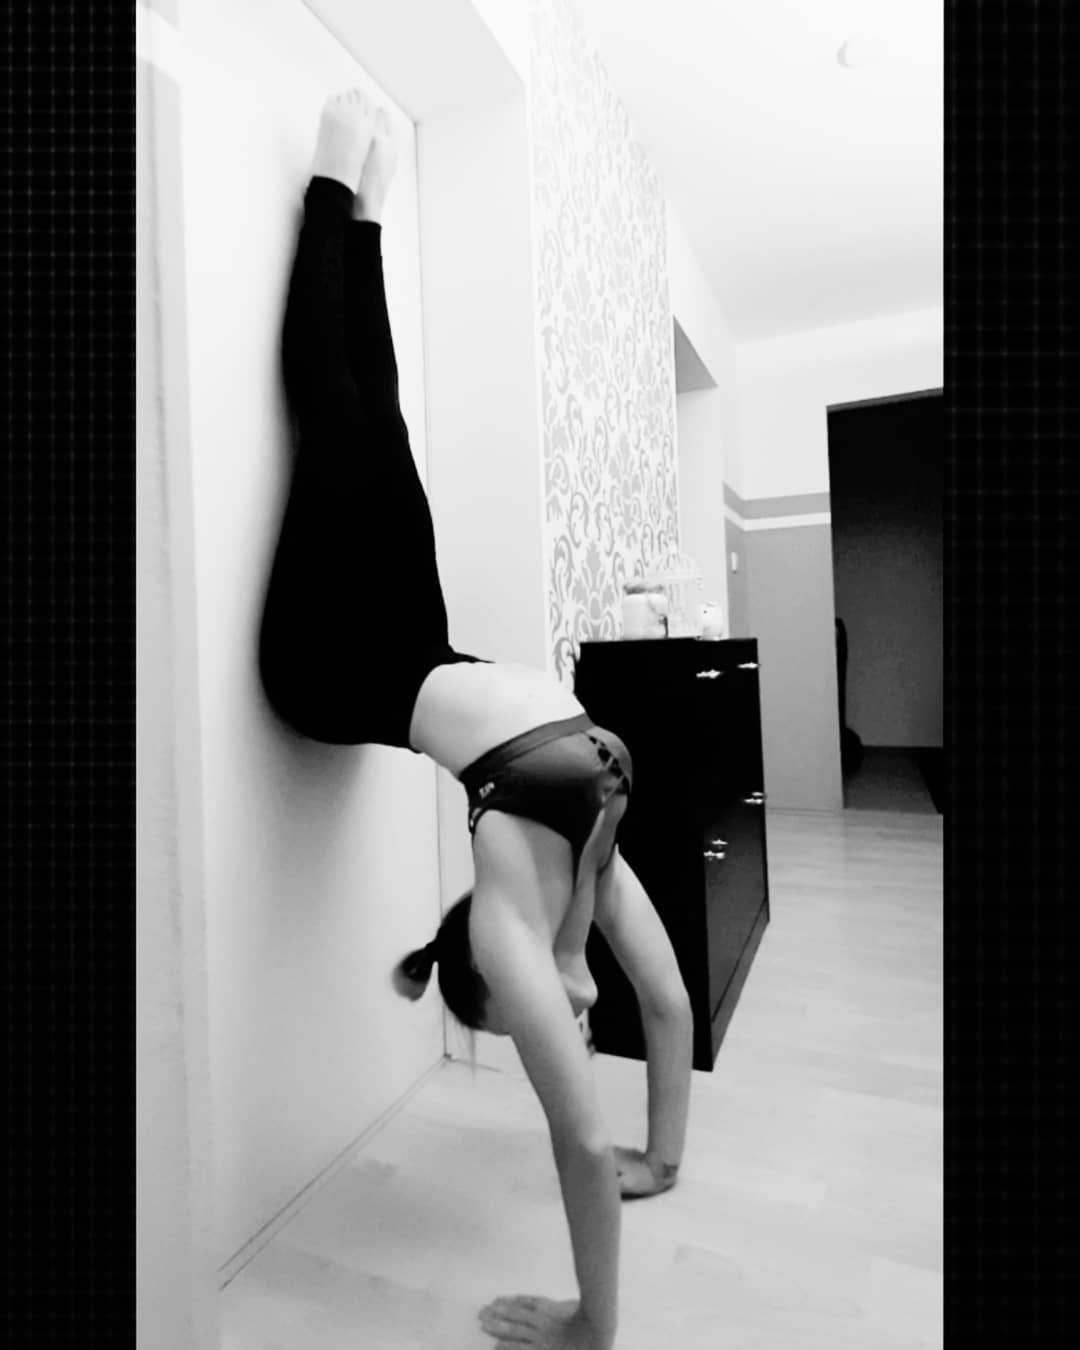 #yogapractice #yogafun #flex #fitness #love 🧘♀️🤸♀️🖤